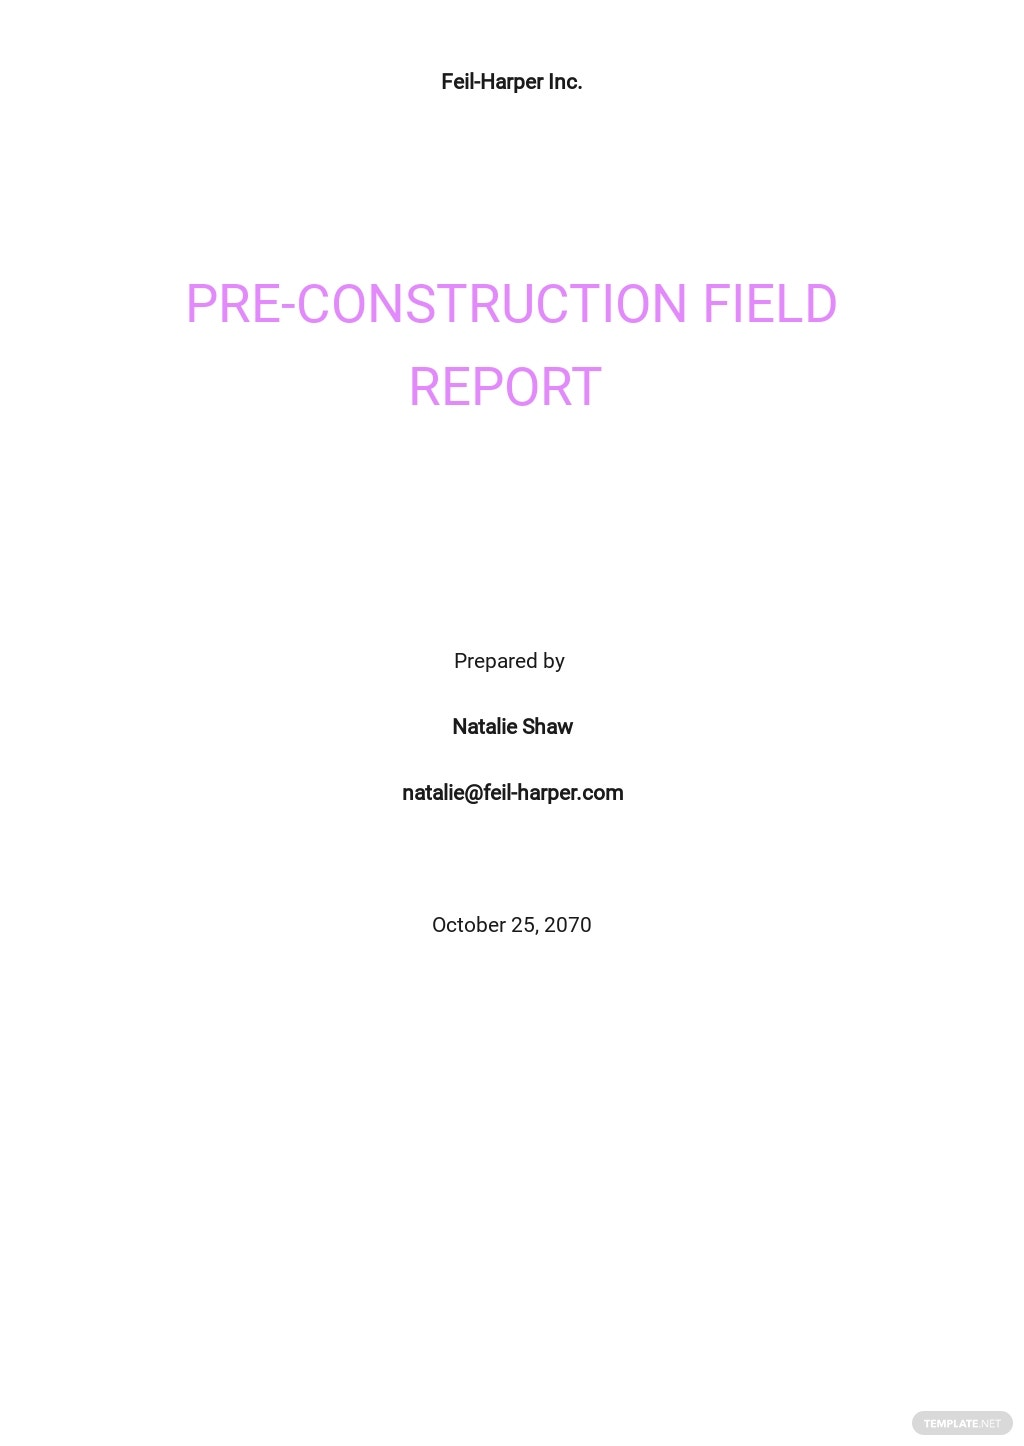 Field Report Template